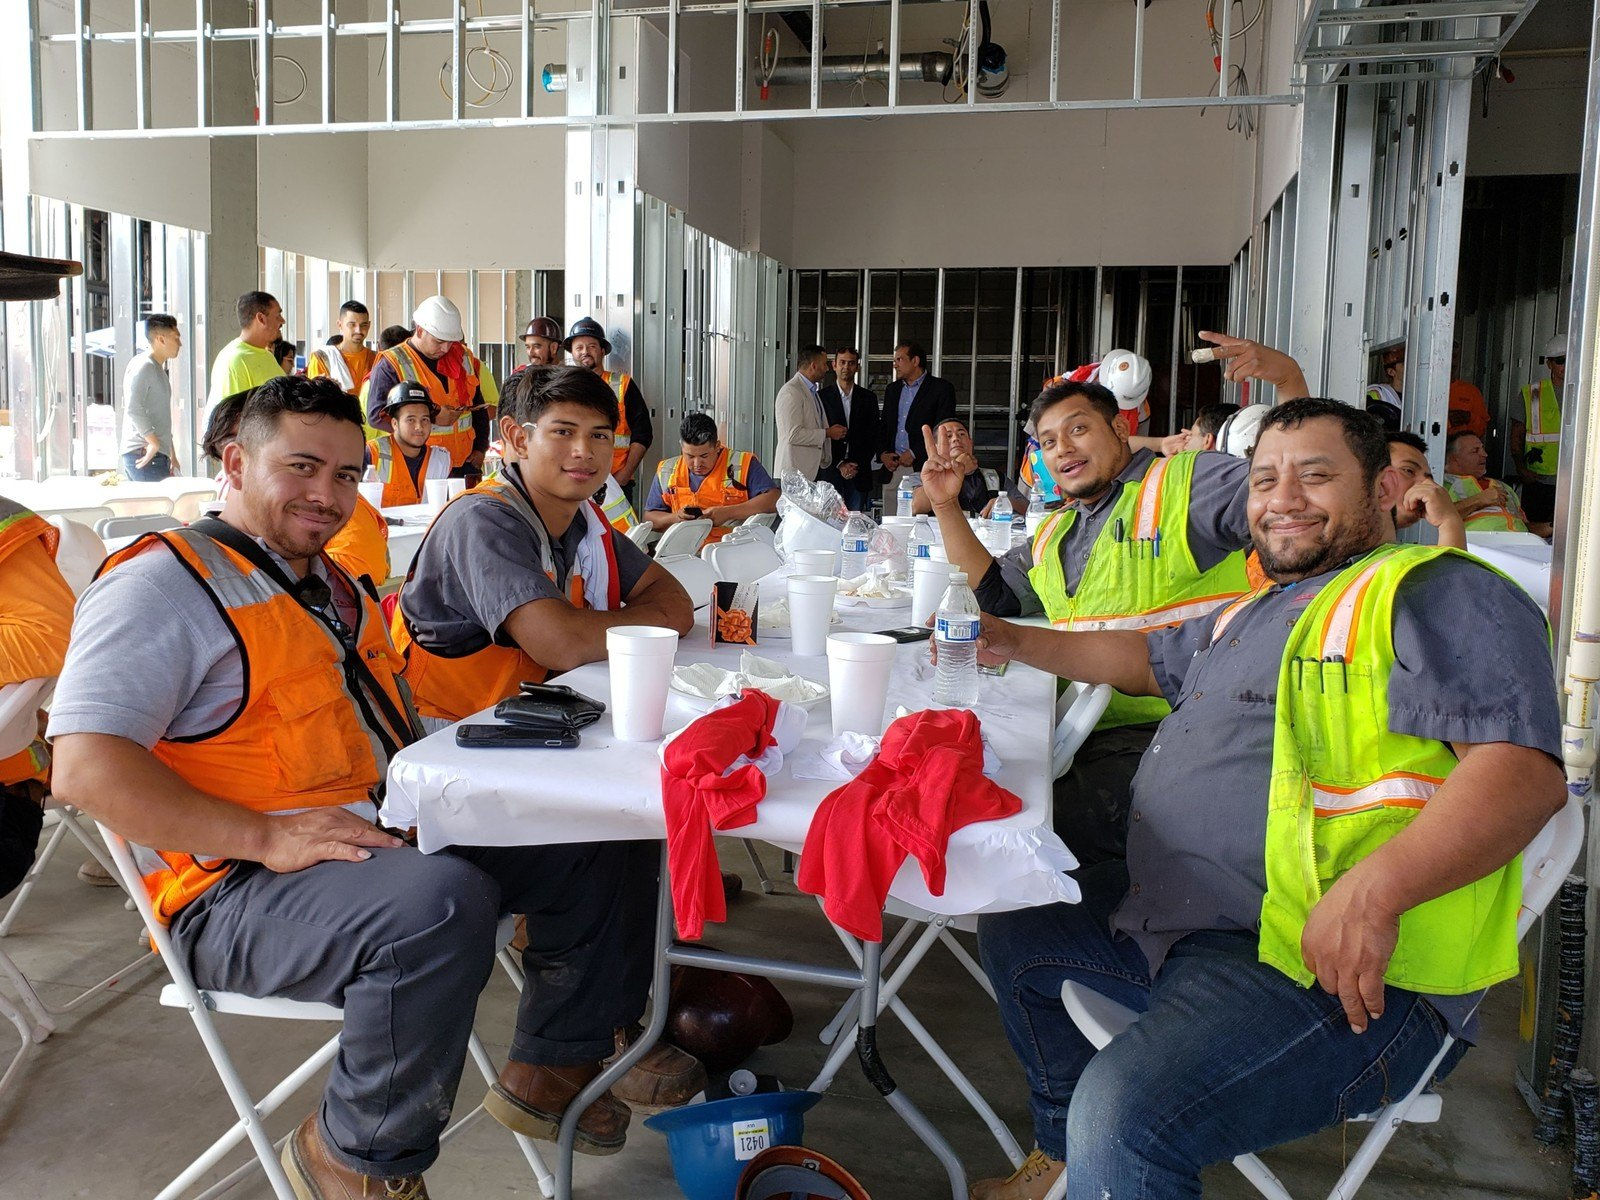 RD Olson Construction - AC Hotel El Segundo -7